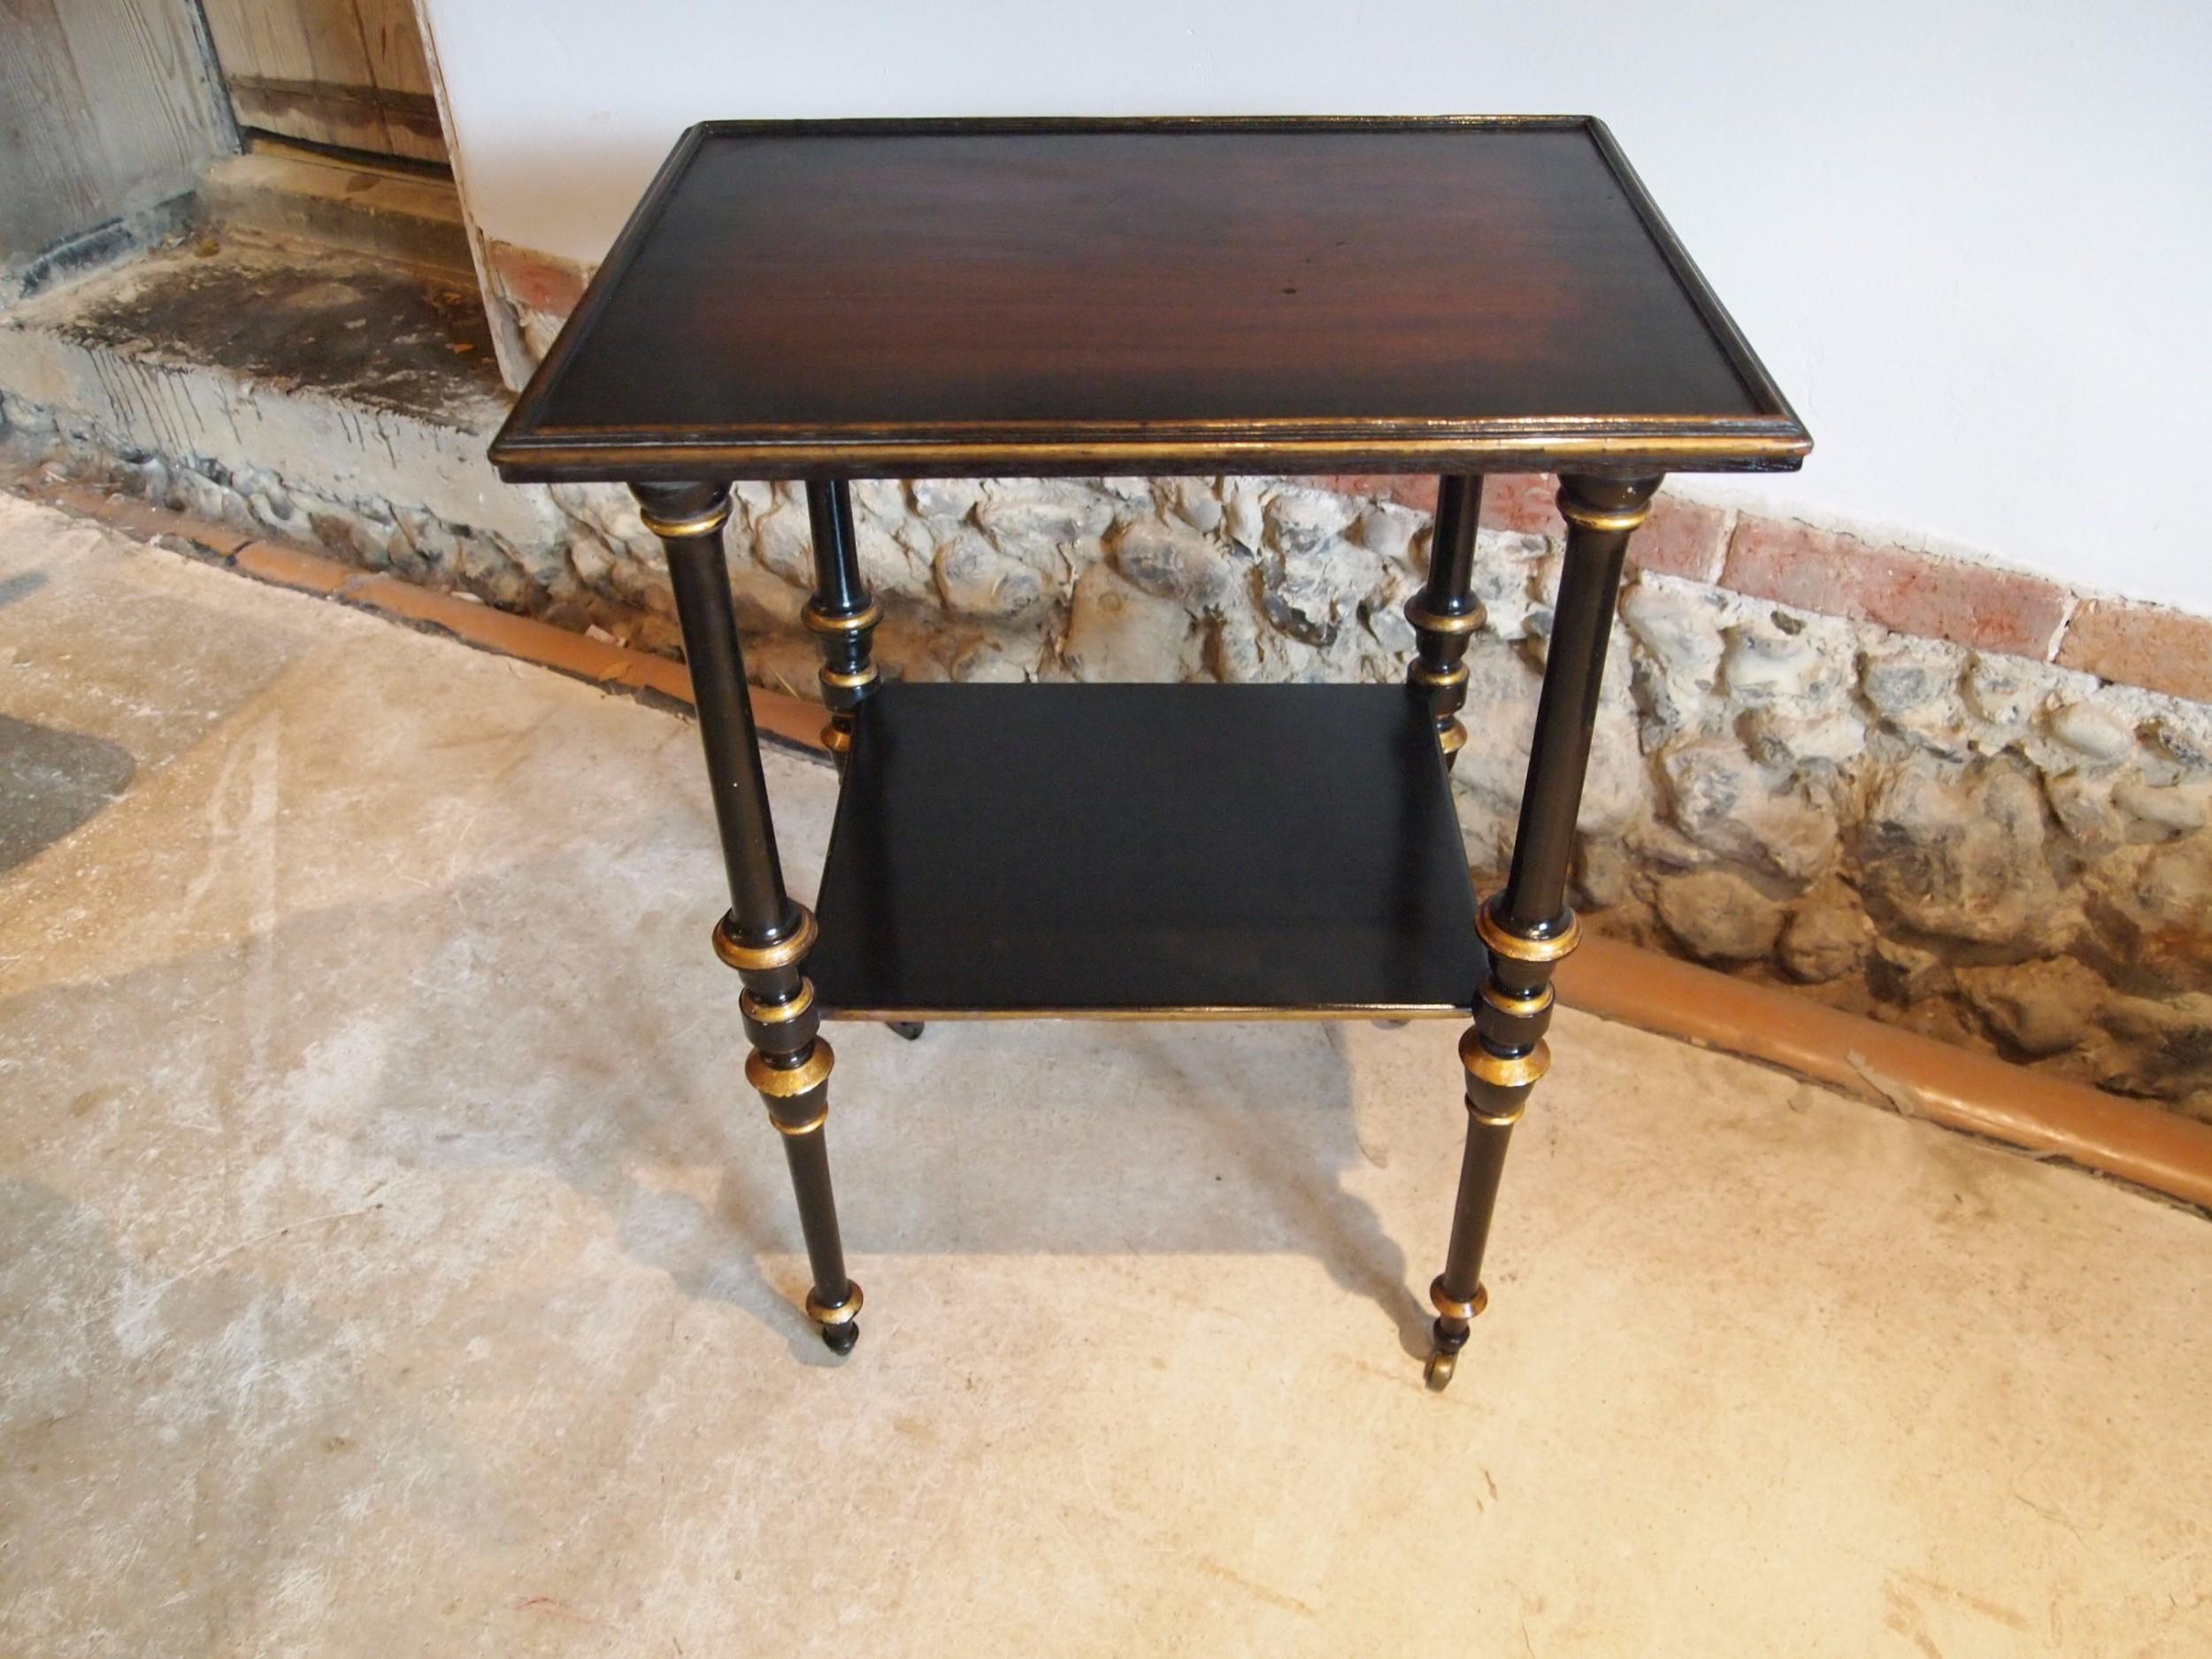 Table george iv regency sofa table c1830 486876 table george iv regency sofa table c1830 geotapseo Image collections